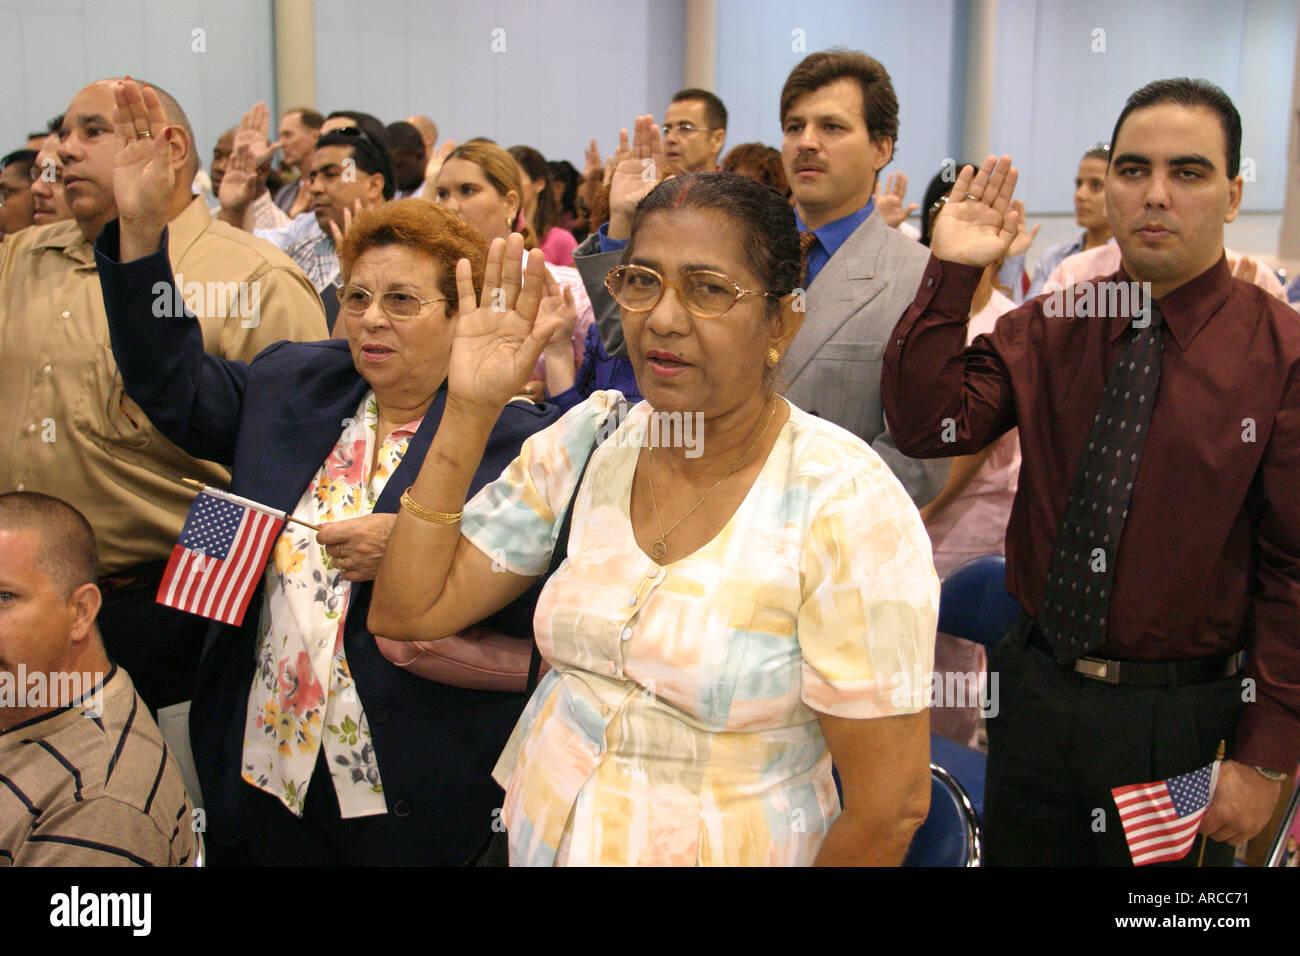 Miami Beach Florida naturalization ceremony oath of citizenship Pledge of Allegiance - Stock Image